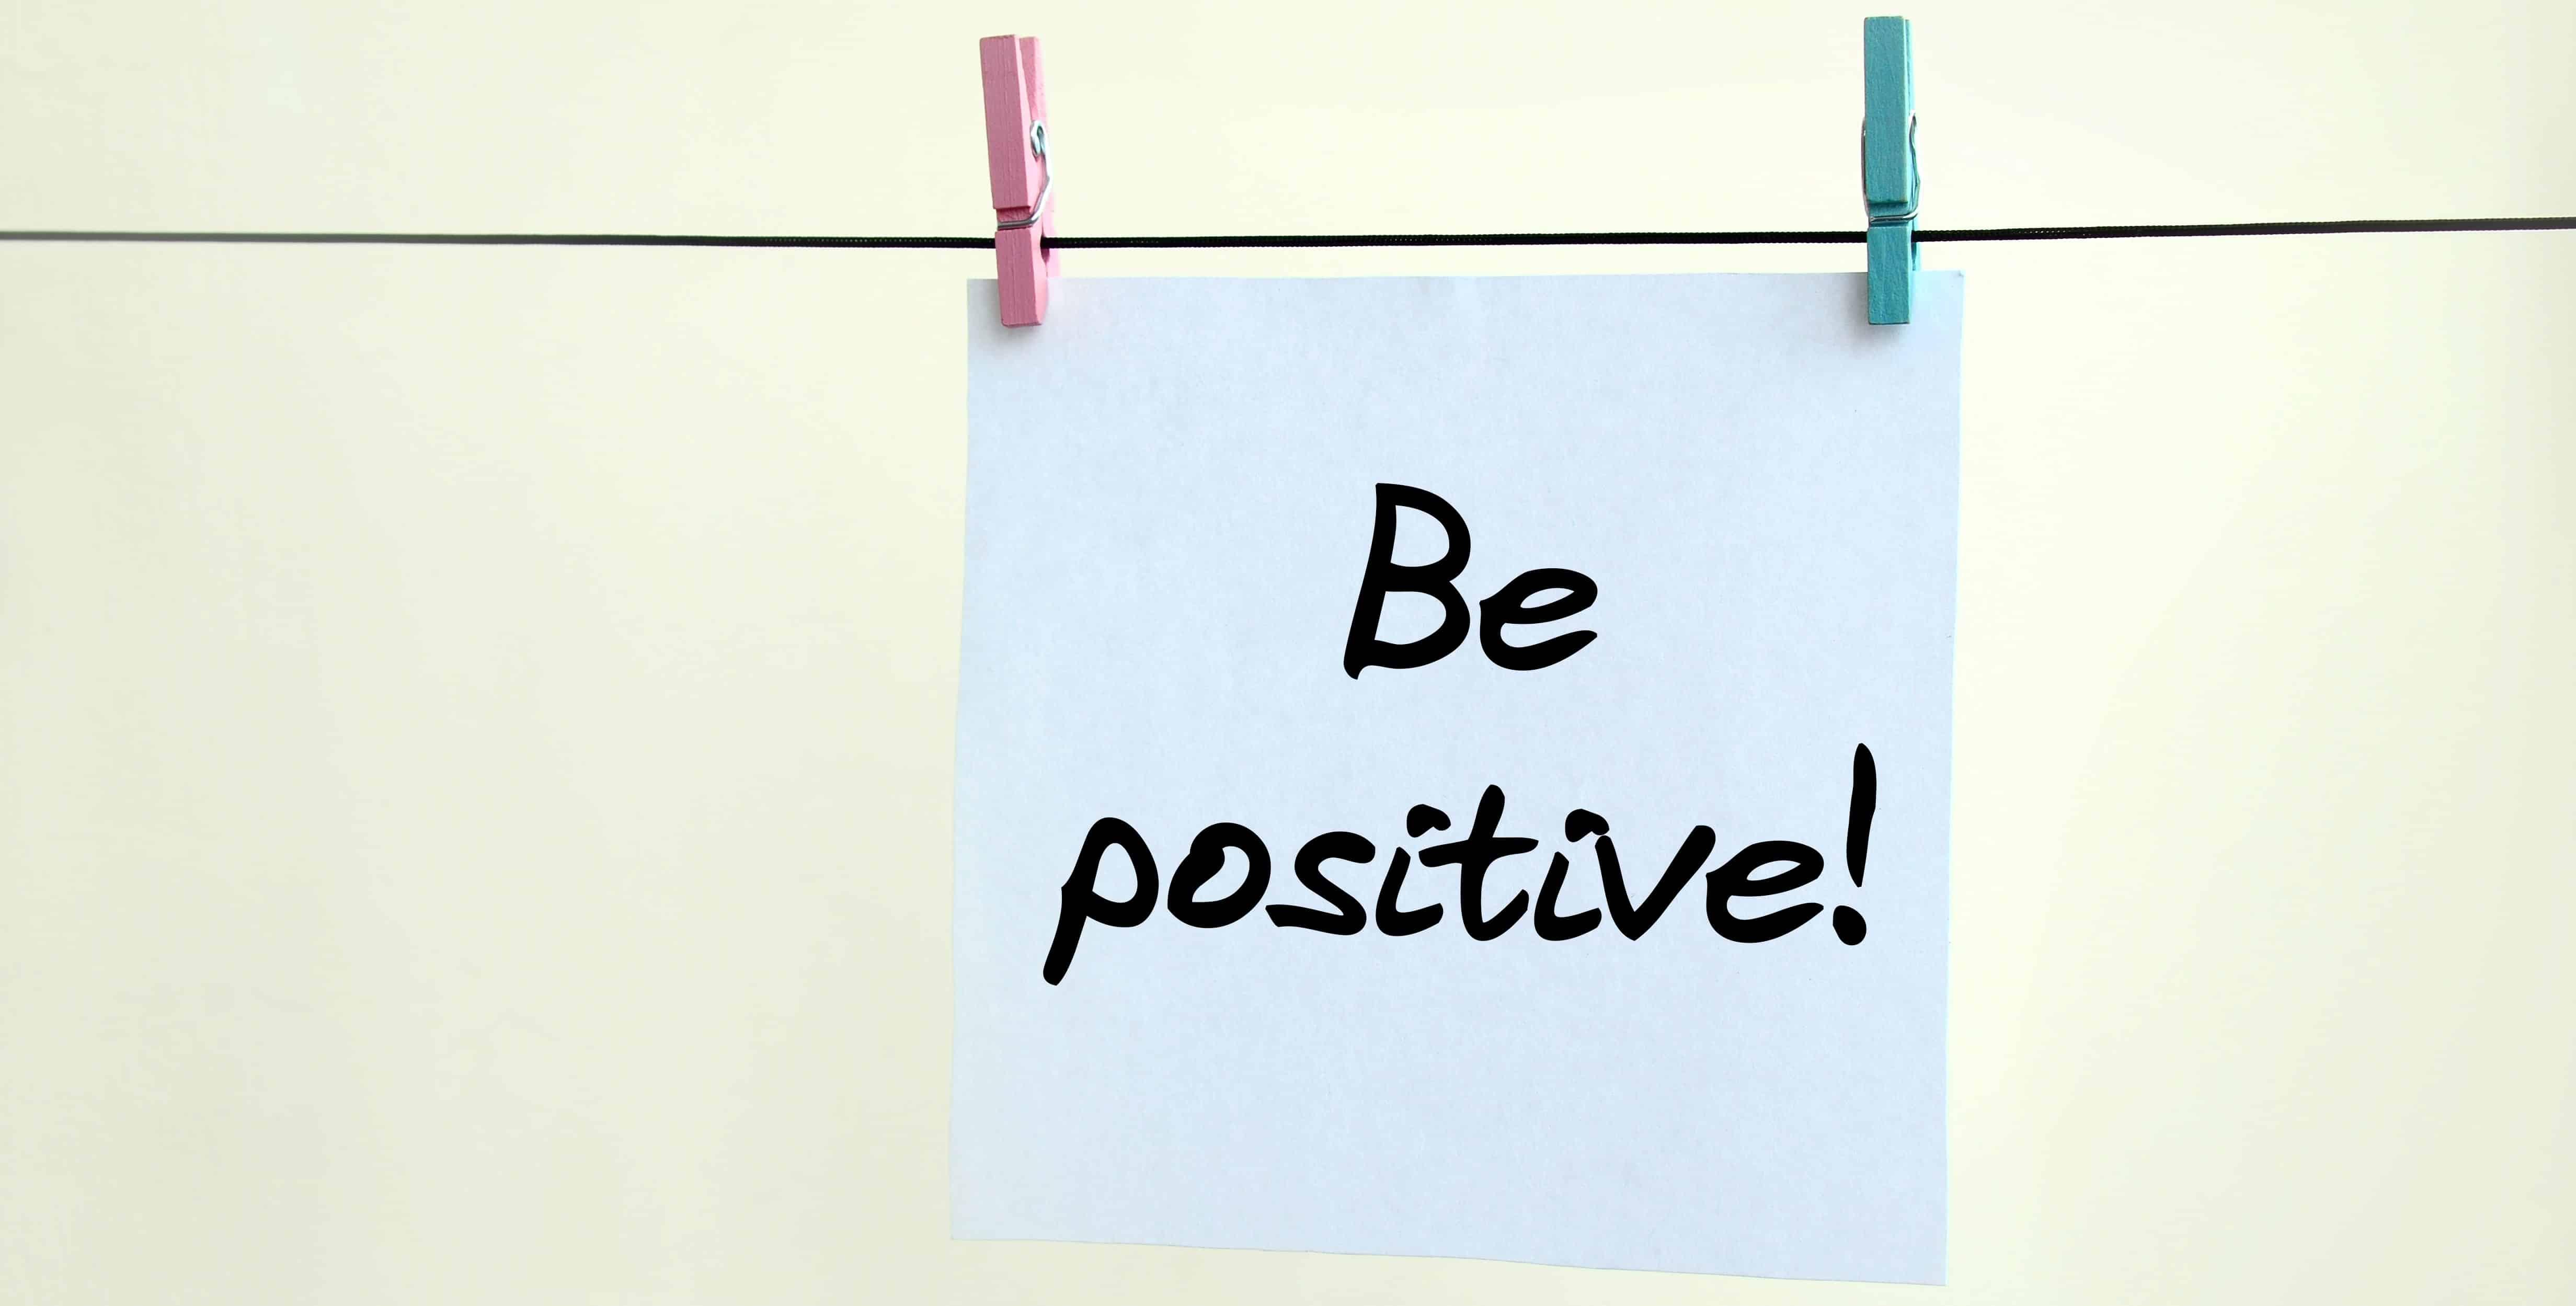 Be Positive - positive mindset - Meditation Hypnosis - self-care tips